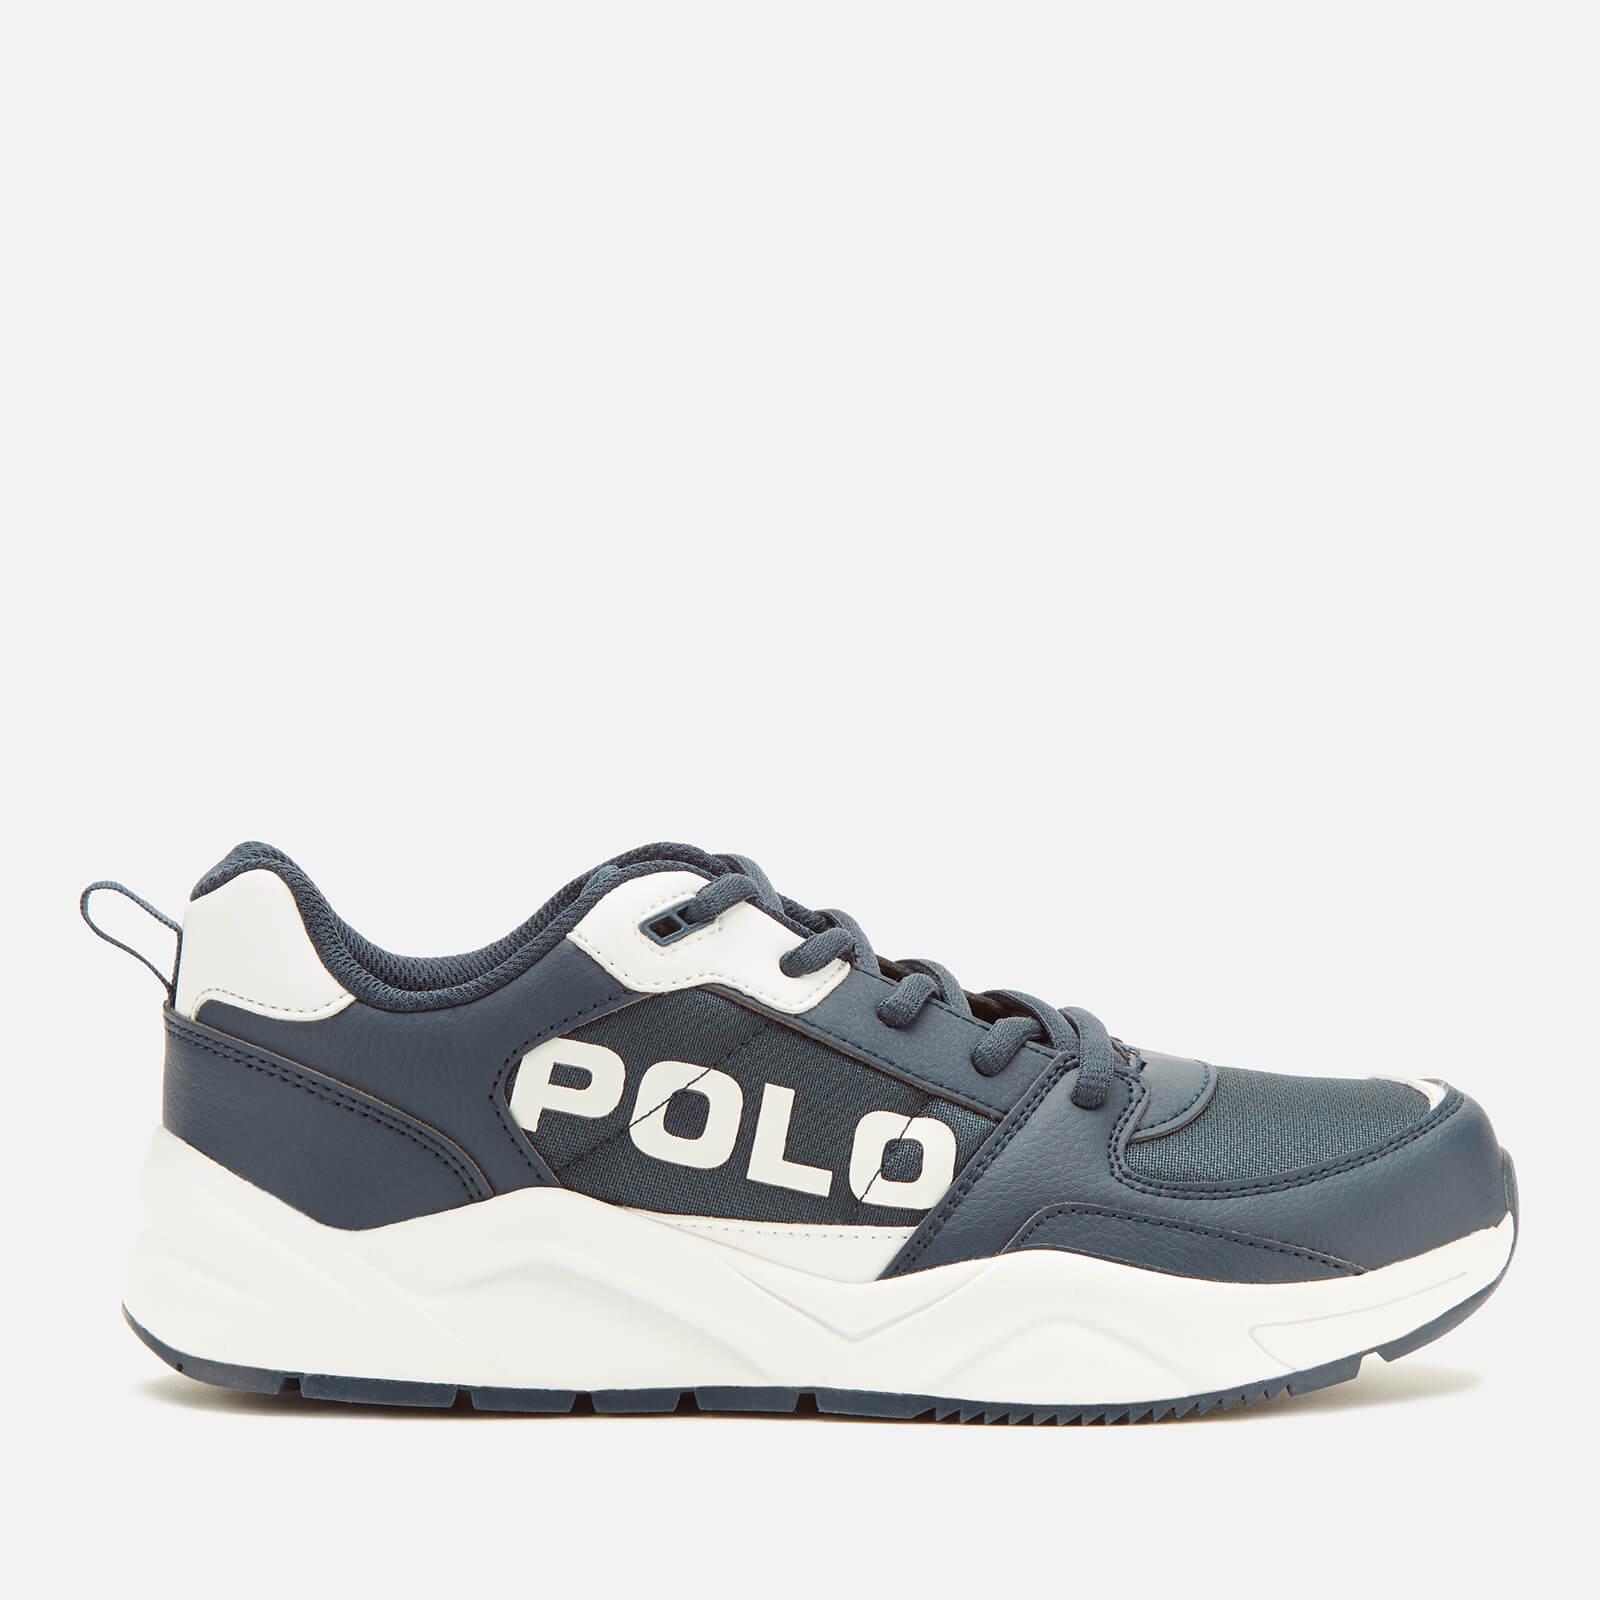 Ralph Lauren Polo Ralph Lauren Kids' Chaning Polo Low Top Trainers - Navy/White - UK 5.5 Kids/EU 39 - Blue